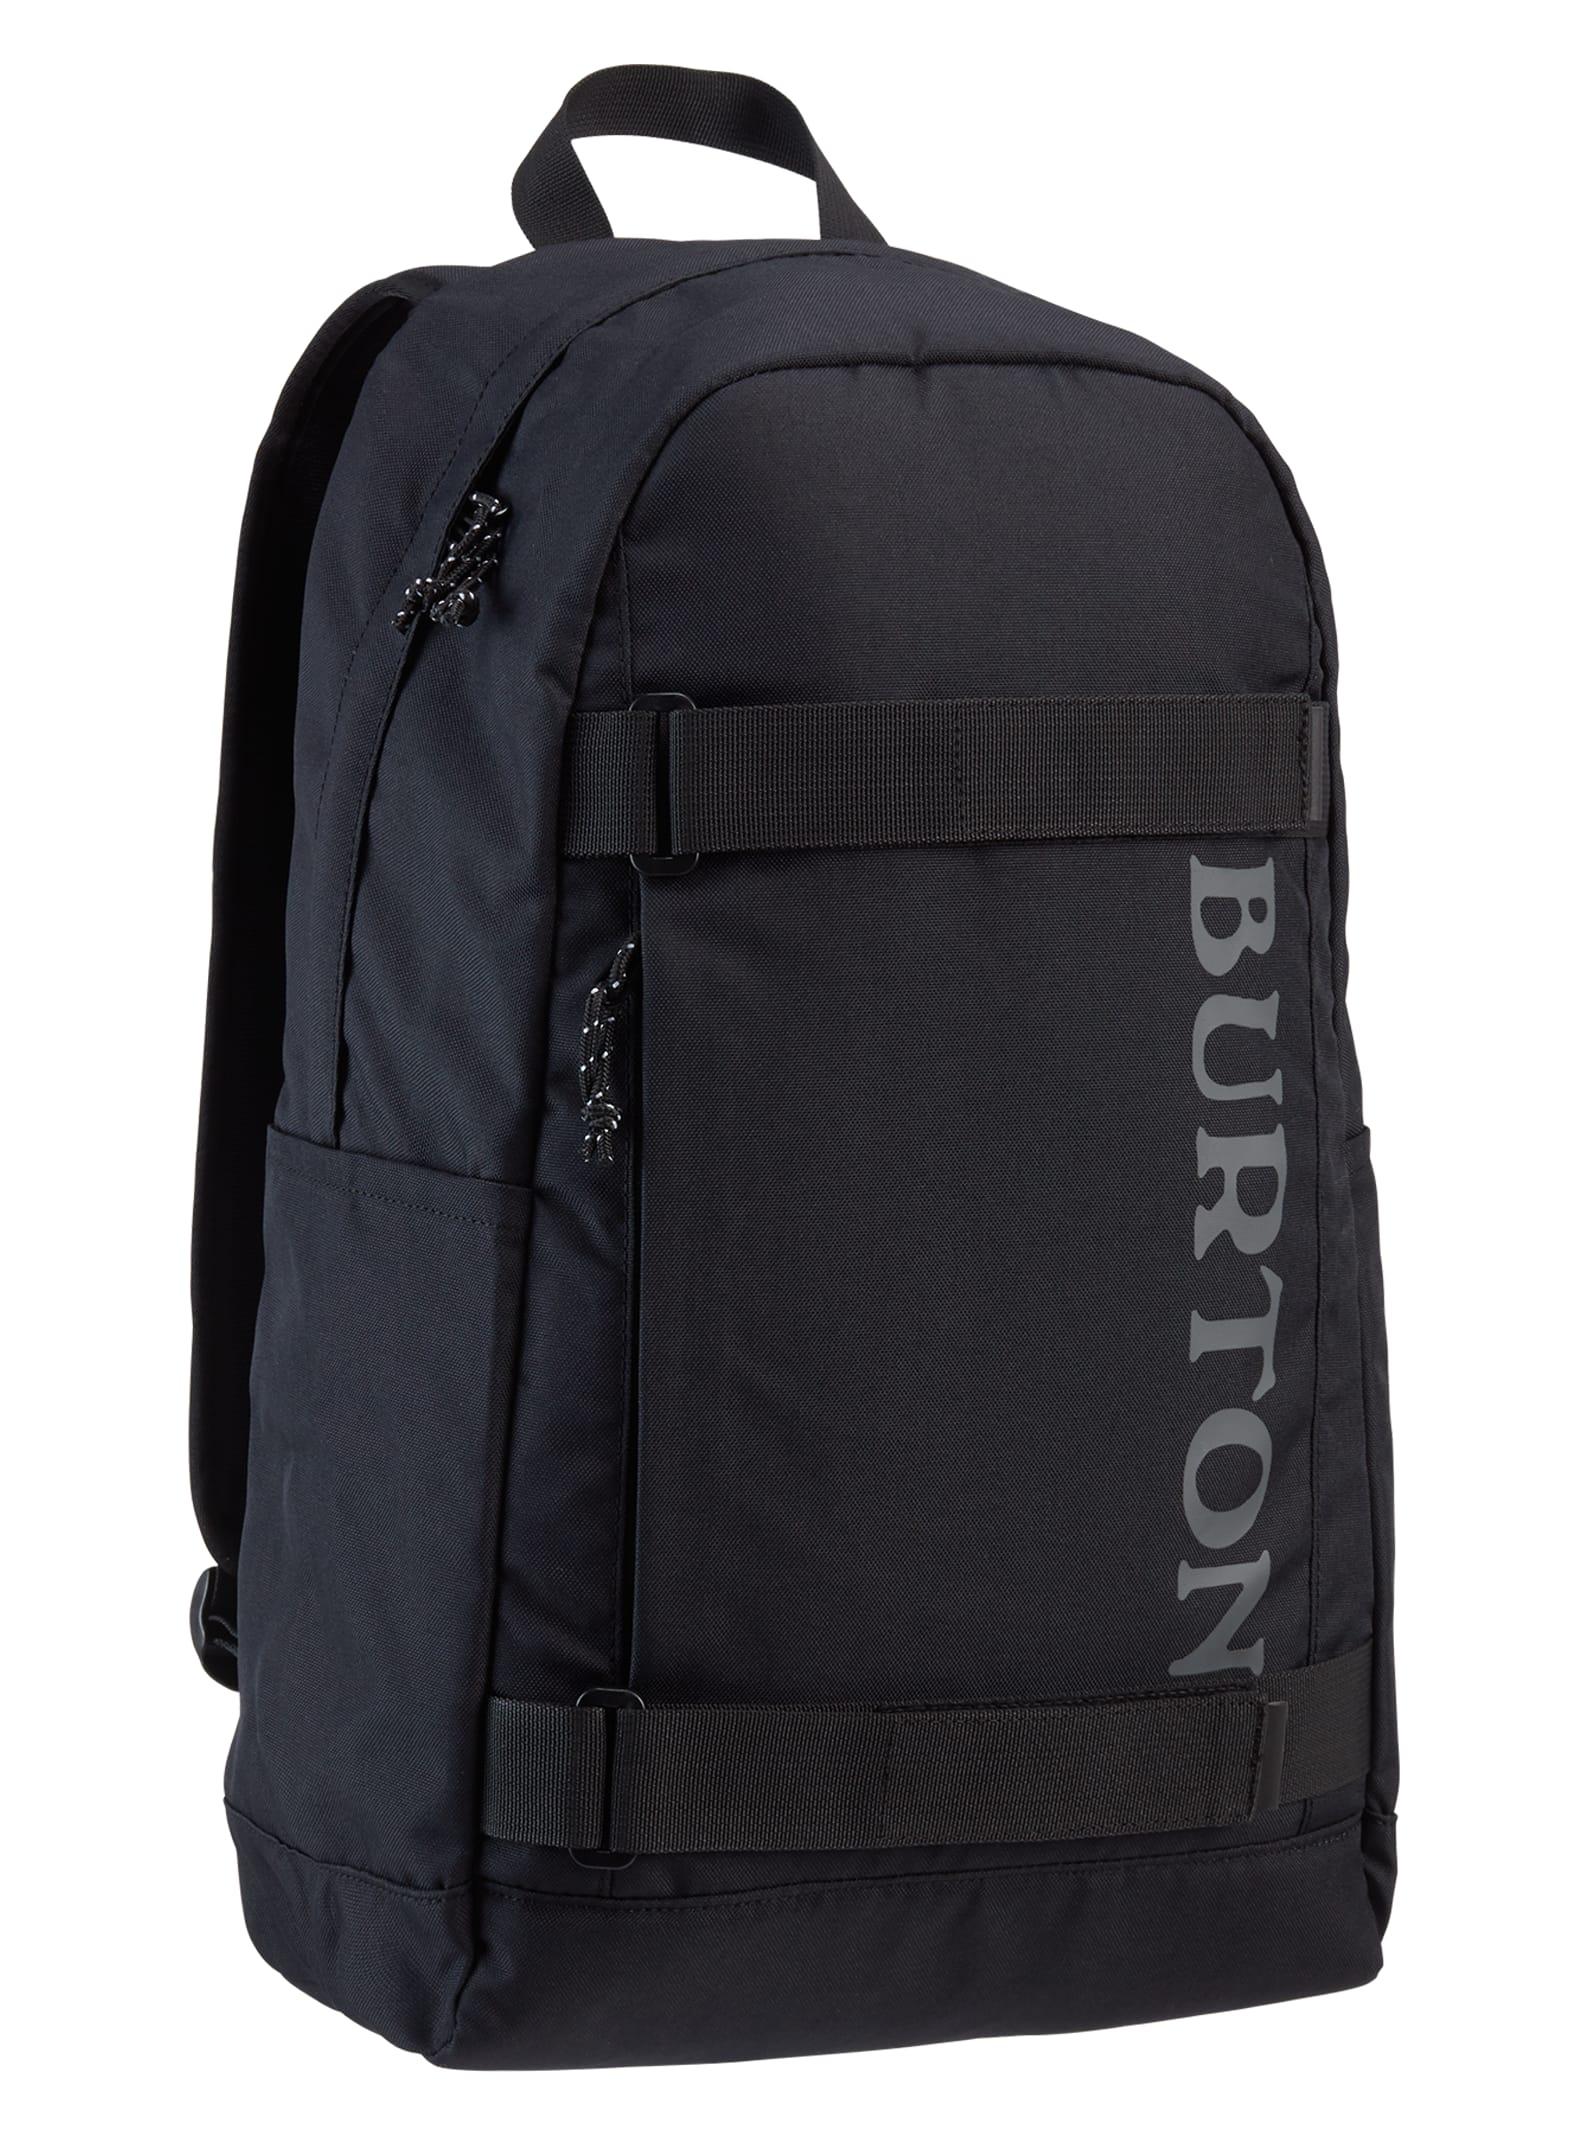 Burton Emphasis 2.0 Zaino Unisex Adulto Barren Camo Print